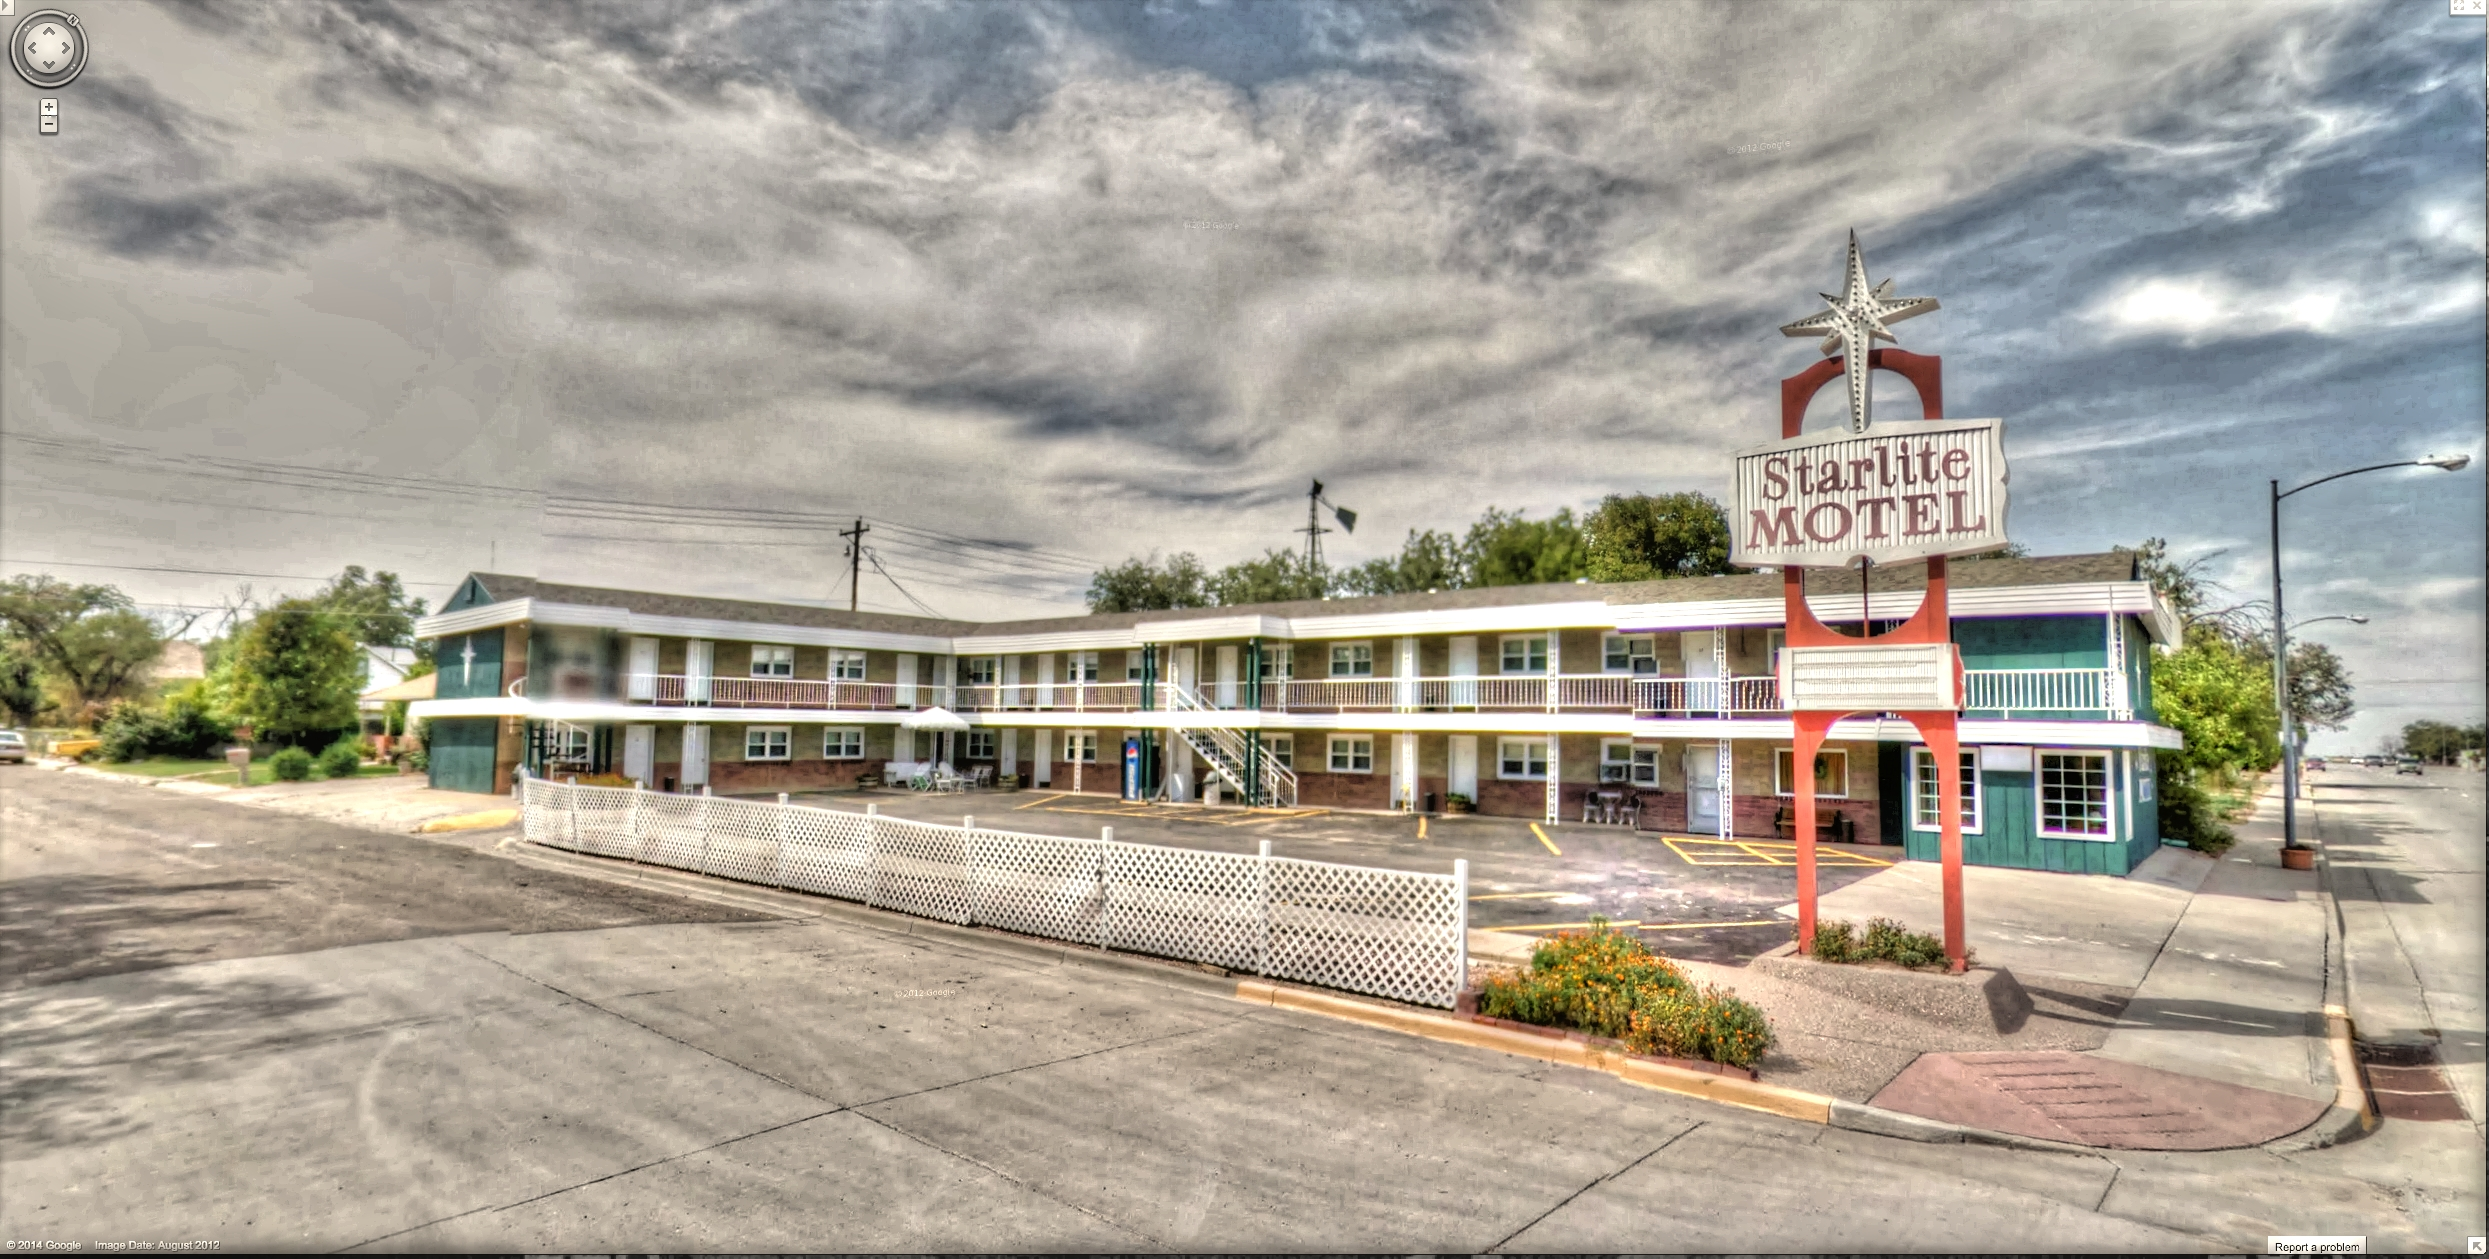 Colorado Inn Motel